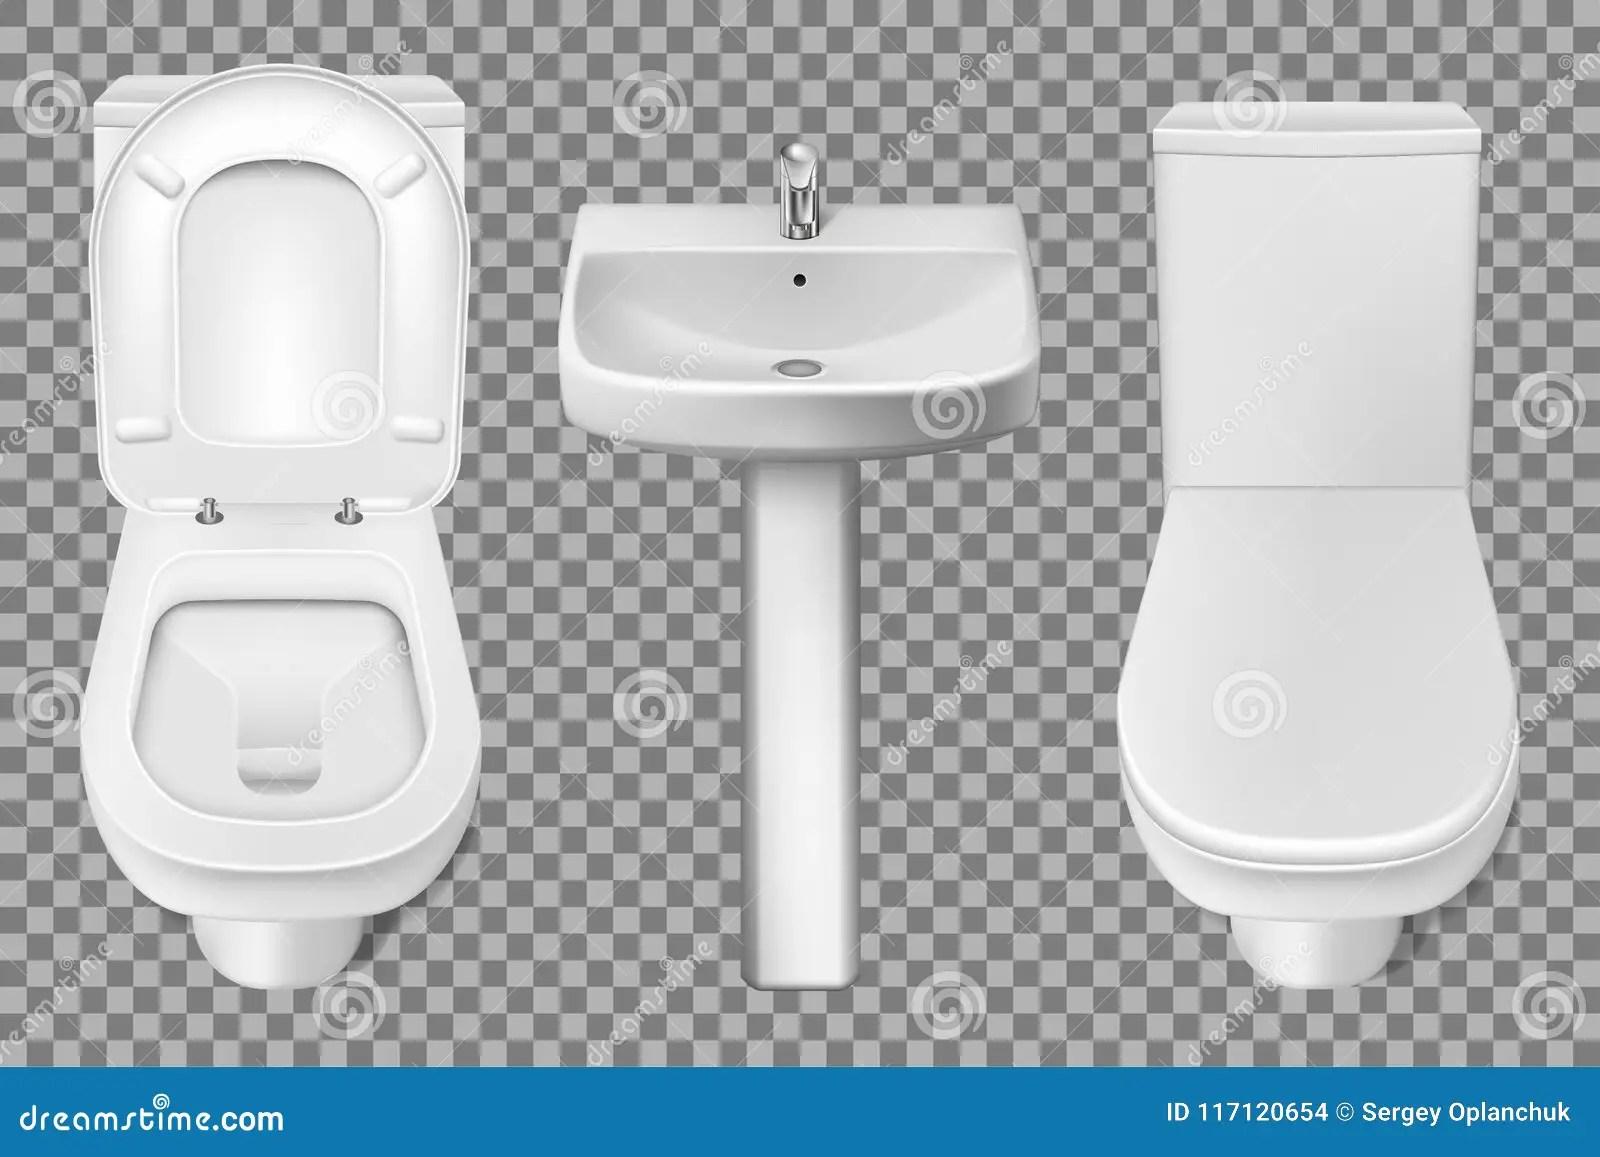 Toilet Sink Stock Illustrations 12 458 Toilet Sink Stock Illustrations Vectors Clipart Dreamstime